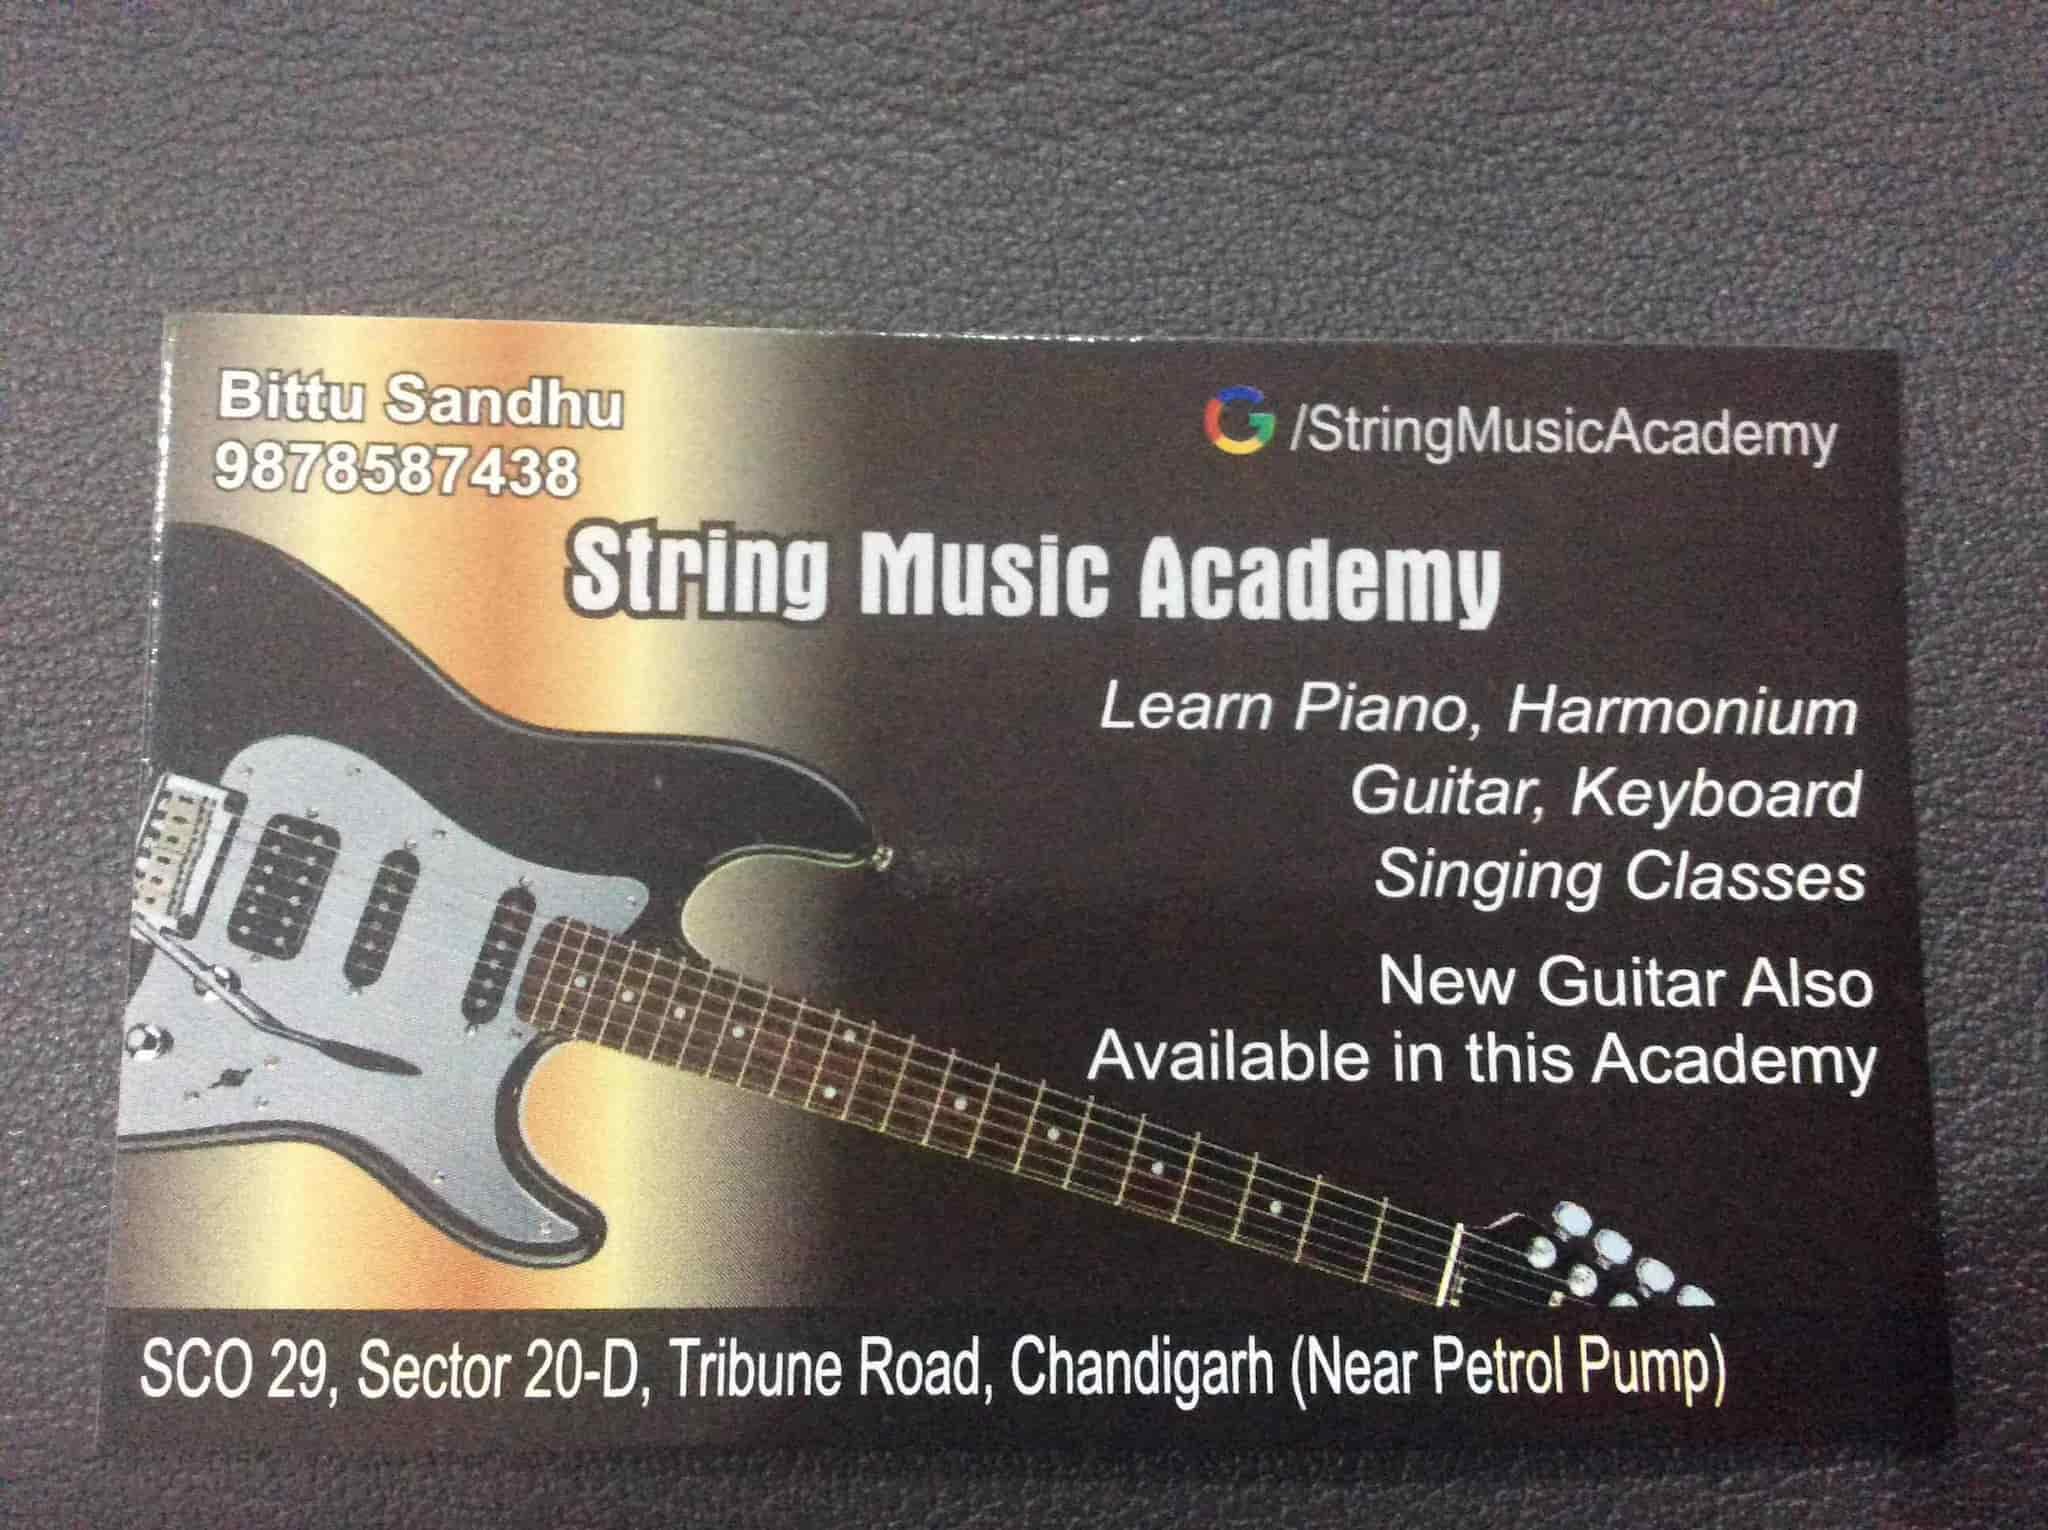 String Music Academy